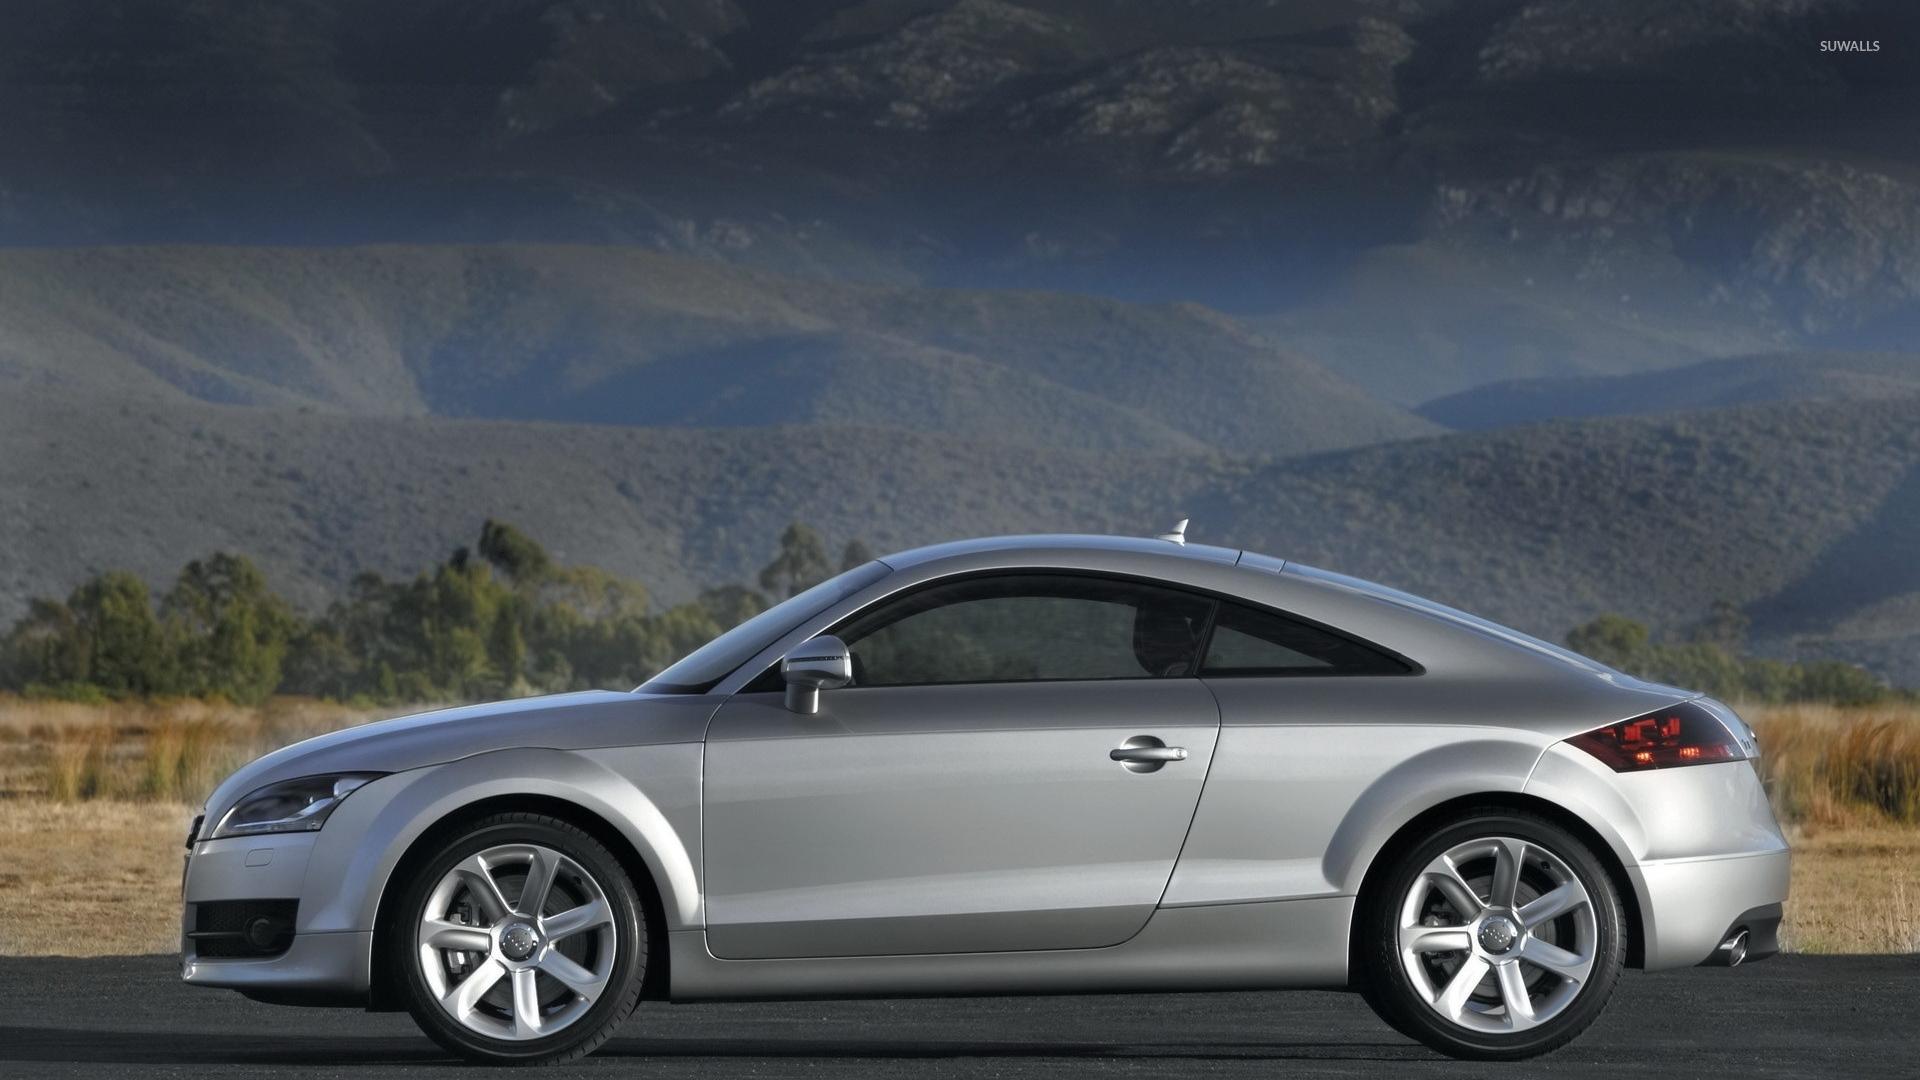 Audi Tt Coupe Wallpaper Car Wallpapers 3794